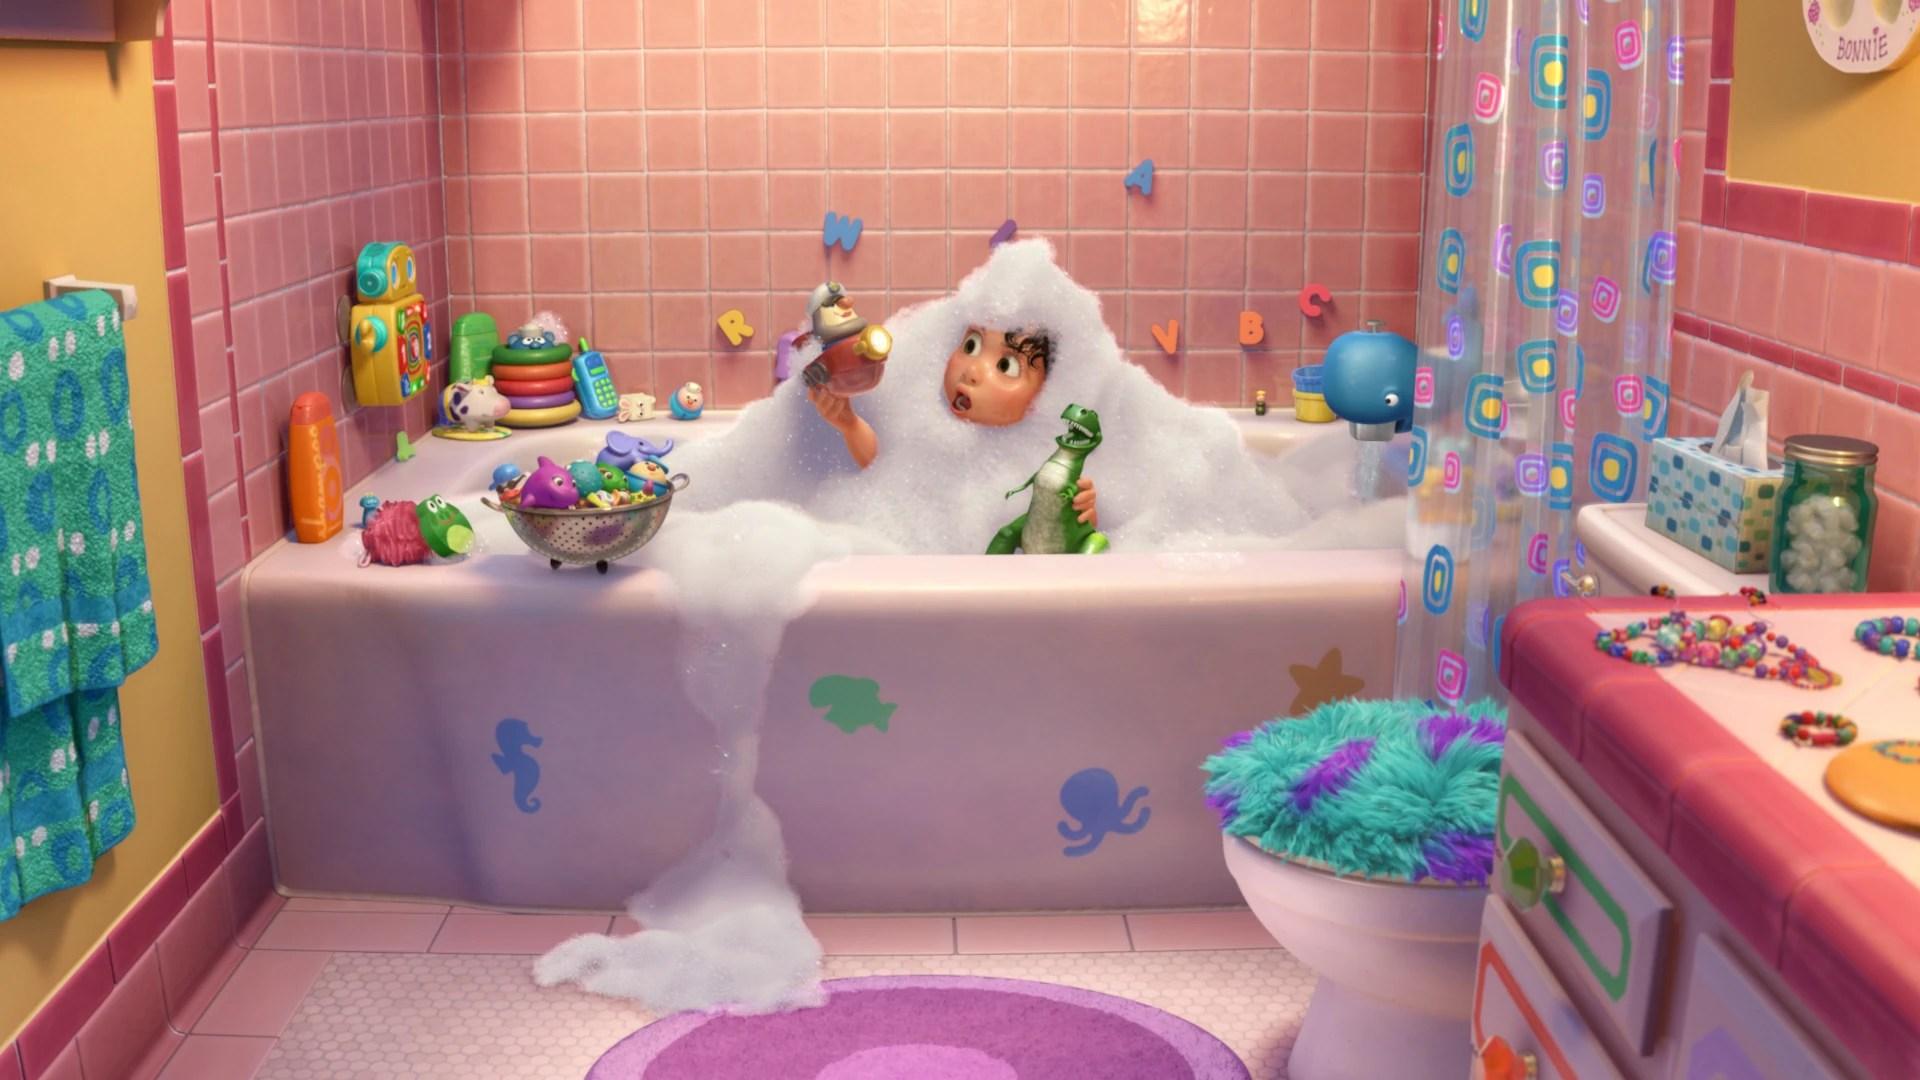 Pixar Planet View Topic Partysaurus Rex Third Toy Story Toon